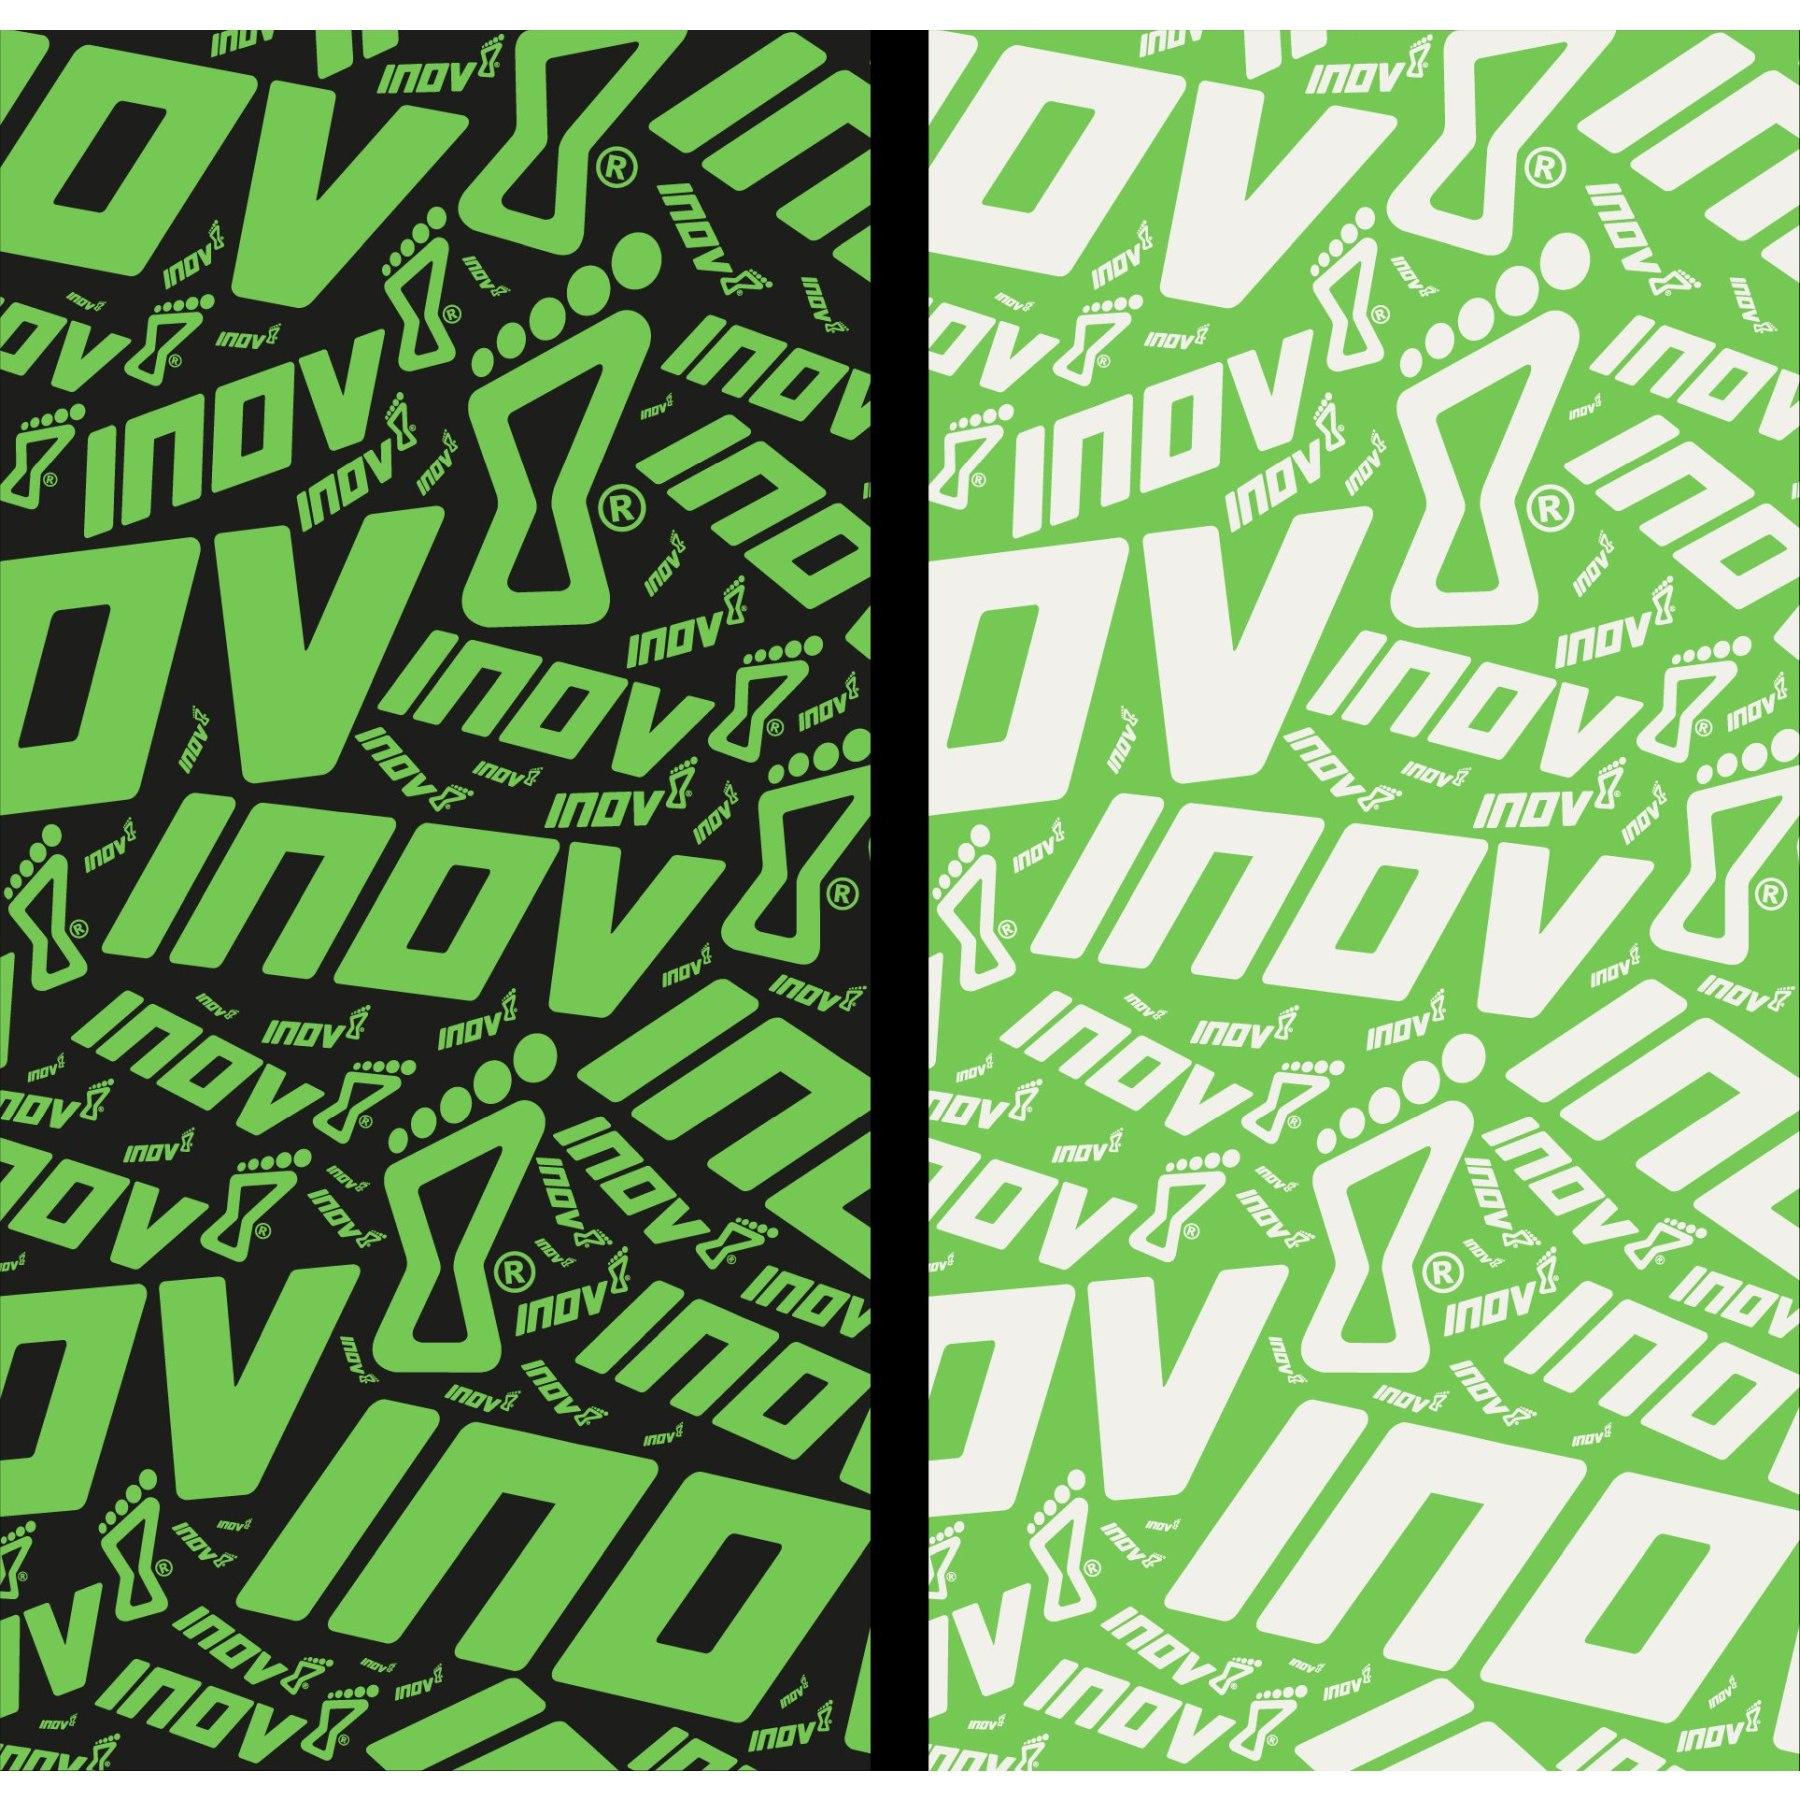 Inov-8 Wrag Multifunctional Cloth (Pair) - black/green green/white